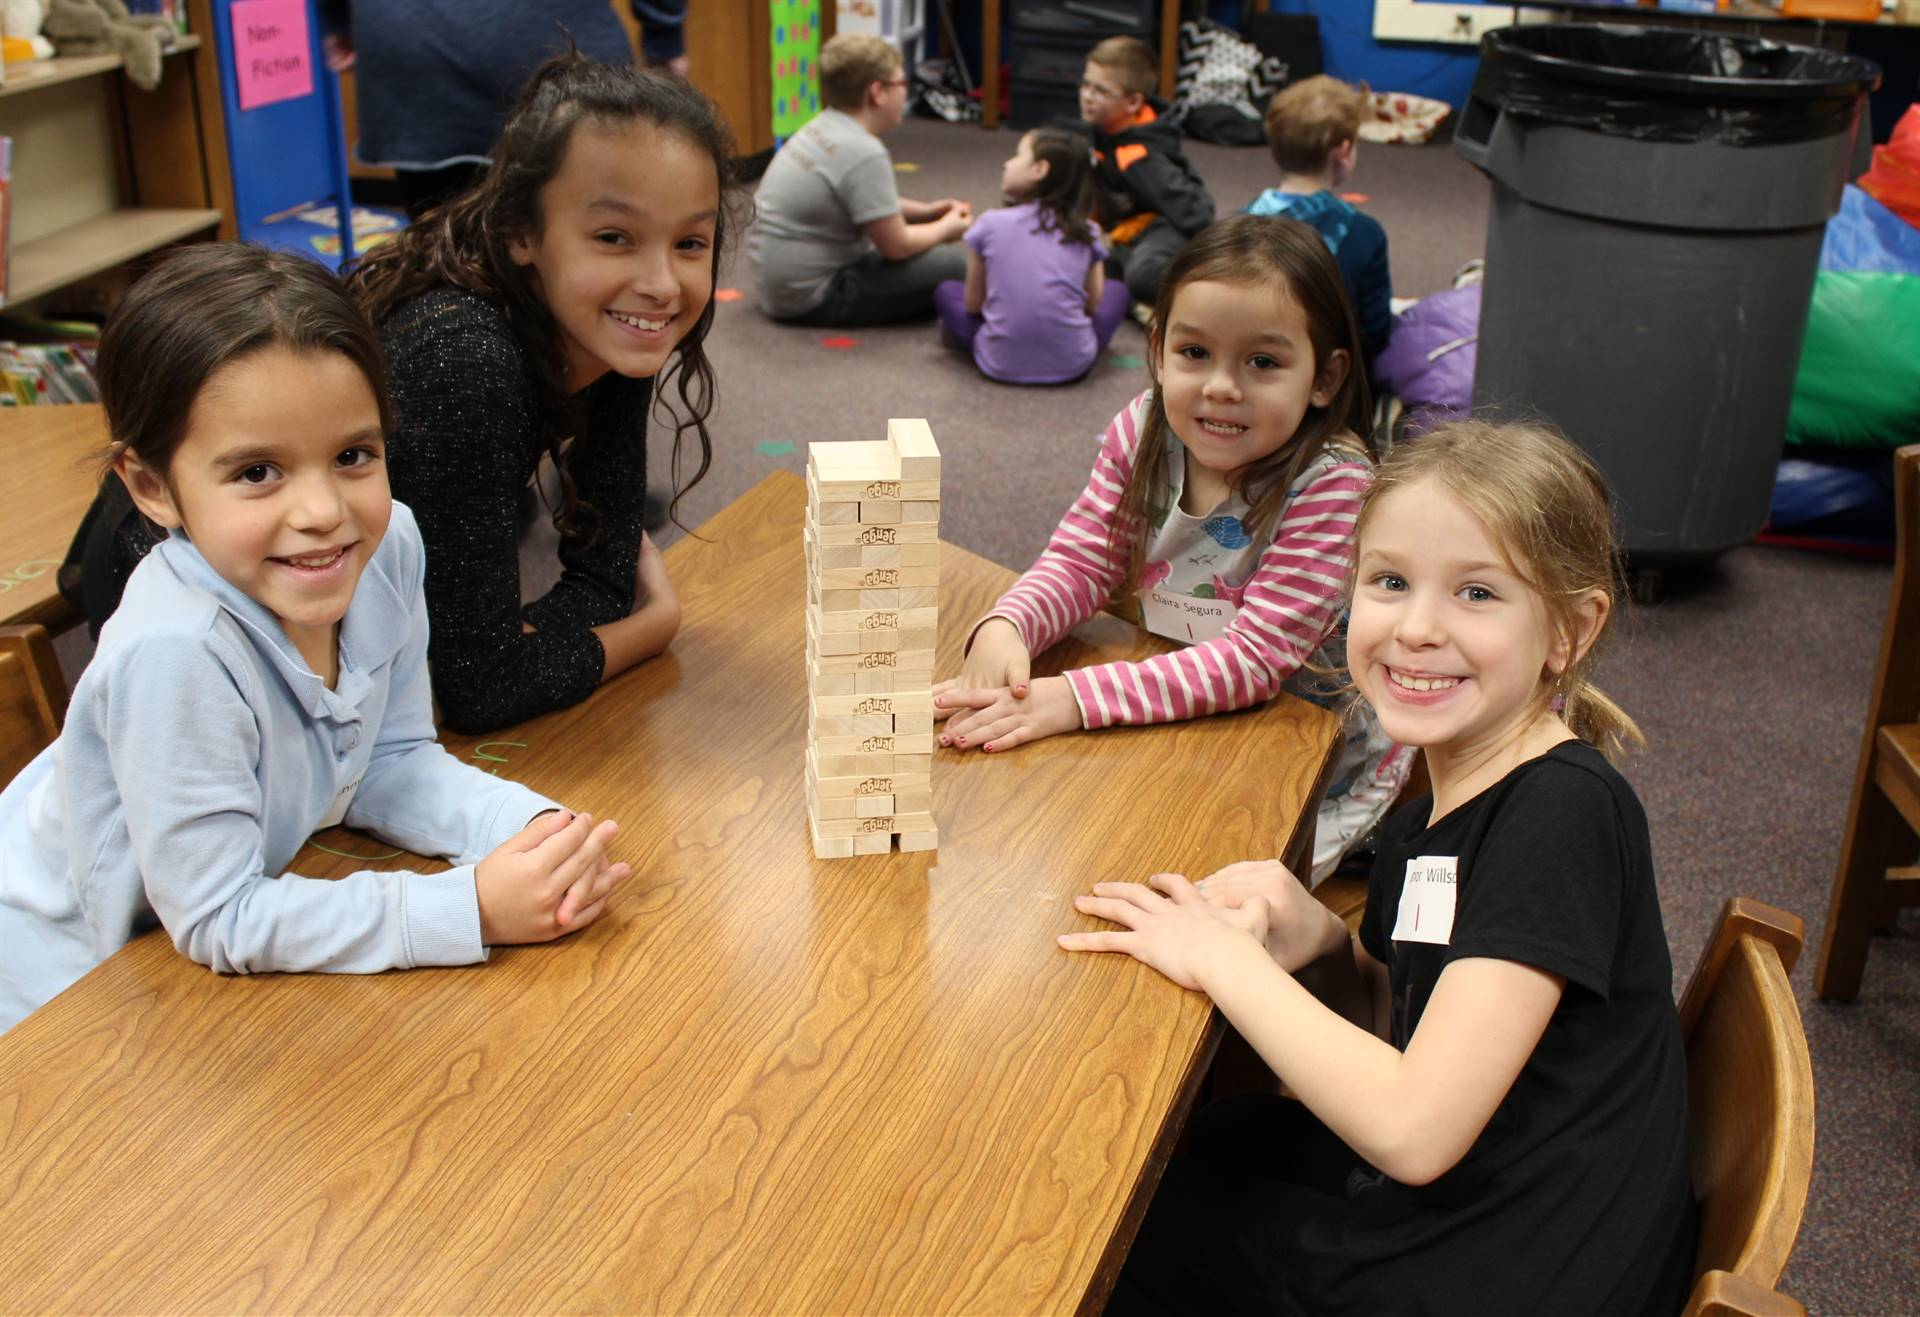 Four students playing Jenga